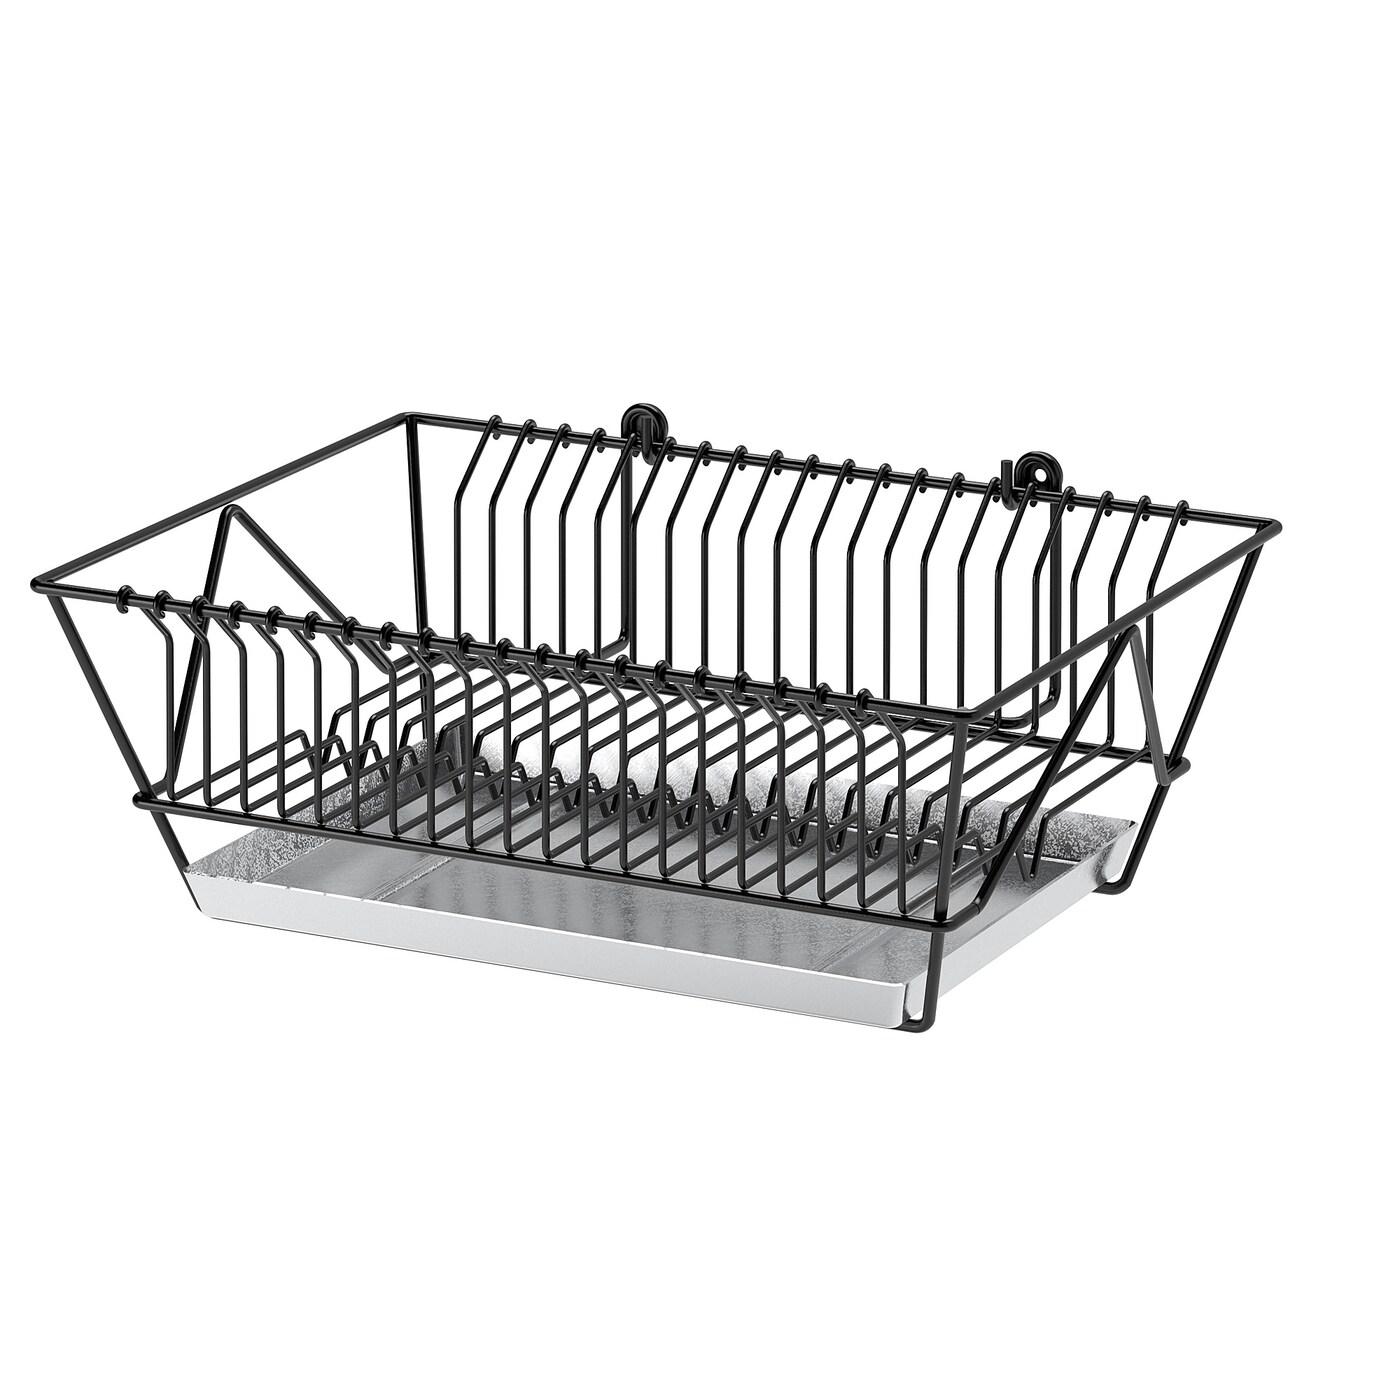 Fintorp Dish Drainer Black Galvanized Ikea